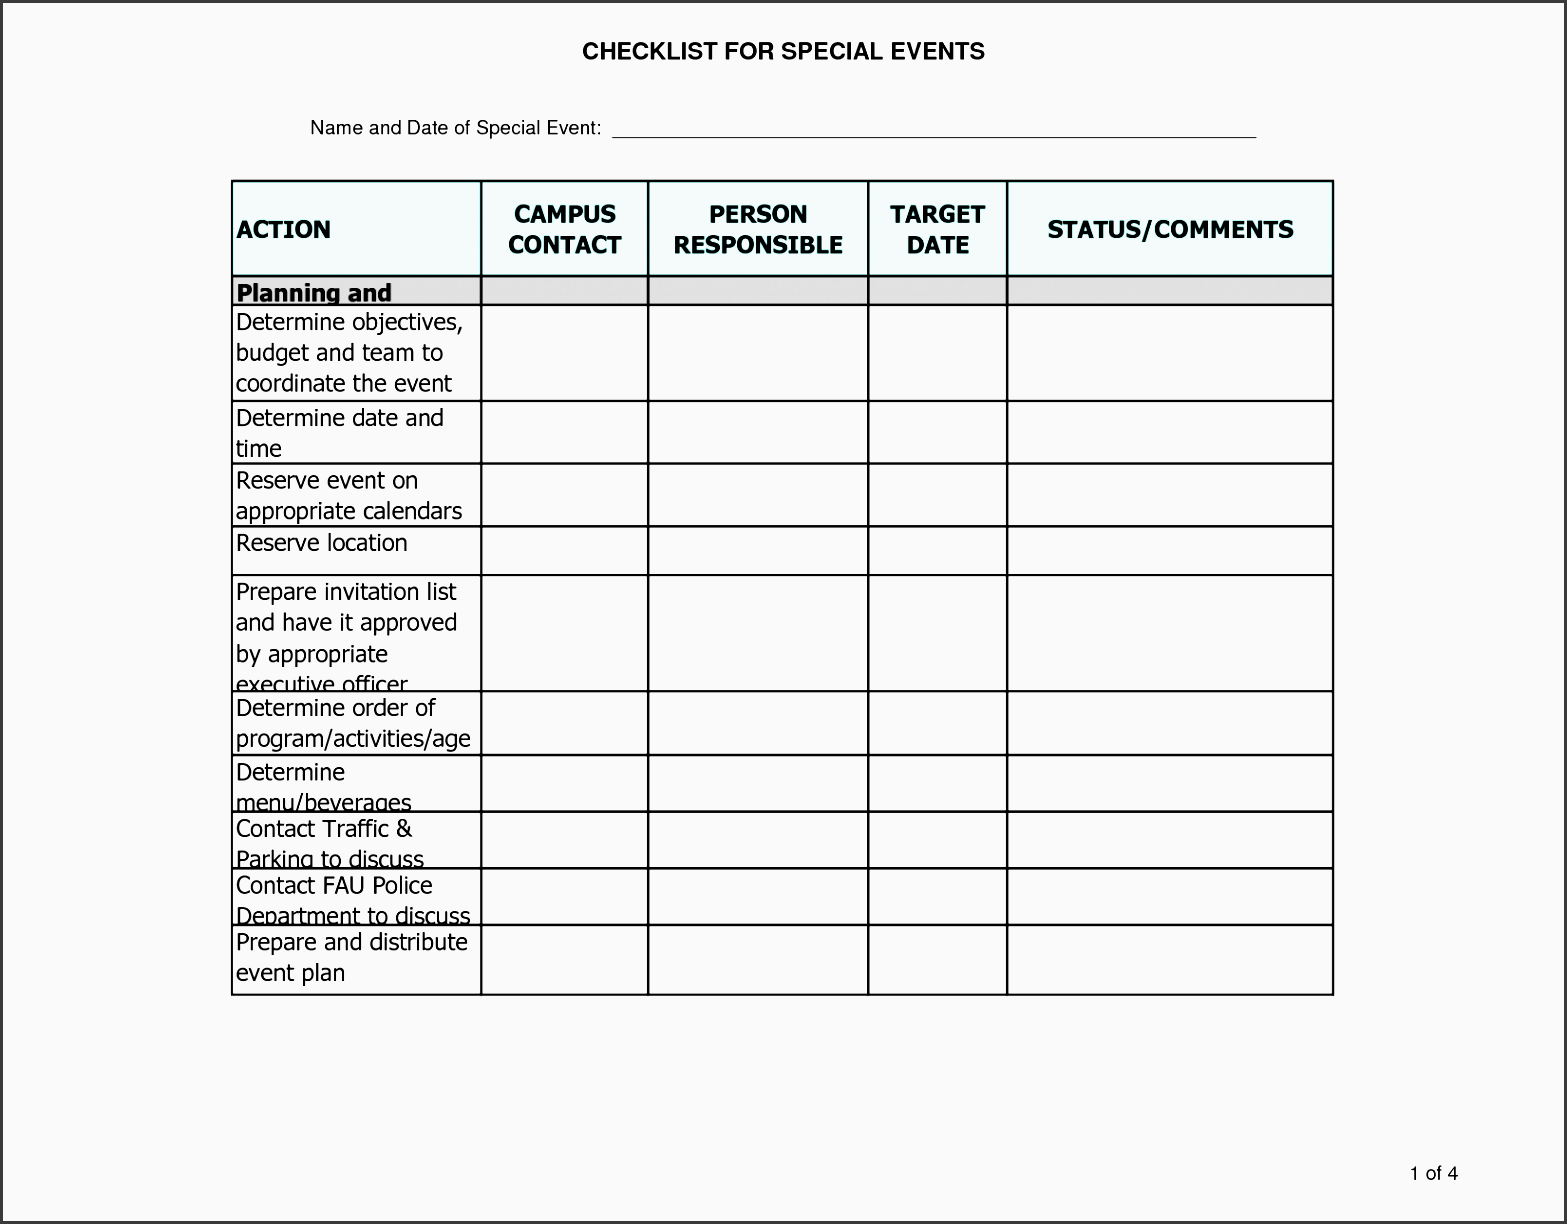 7 career planning checklist in excel